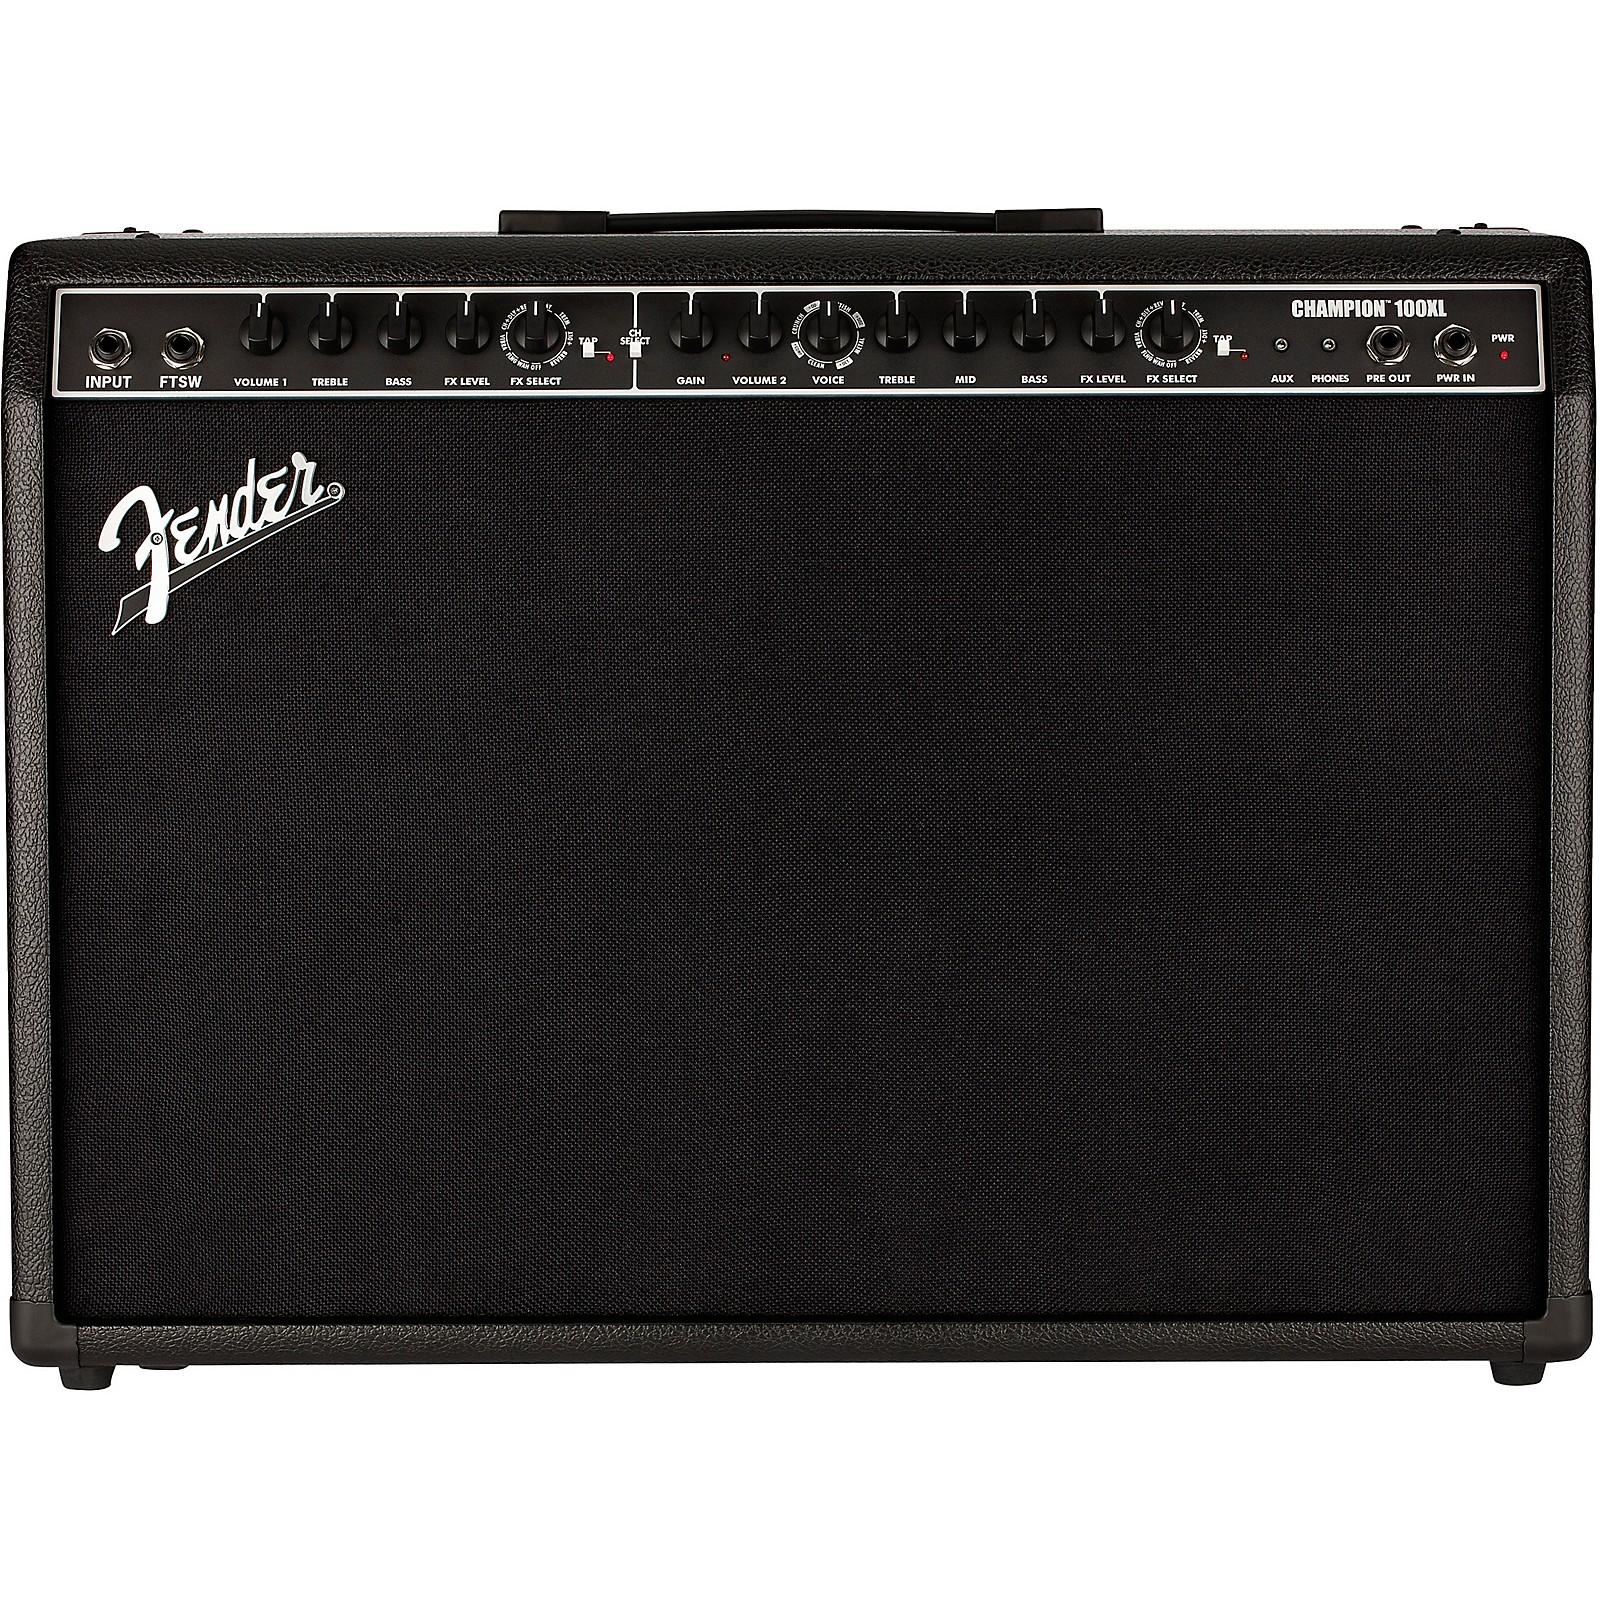 Fender Champion 100XL 100W 2x12 Guitar Combo Amp